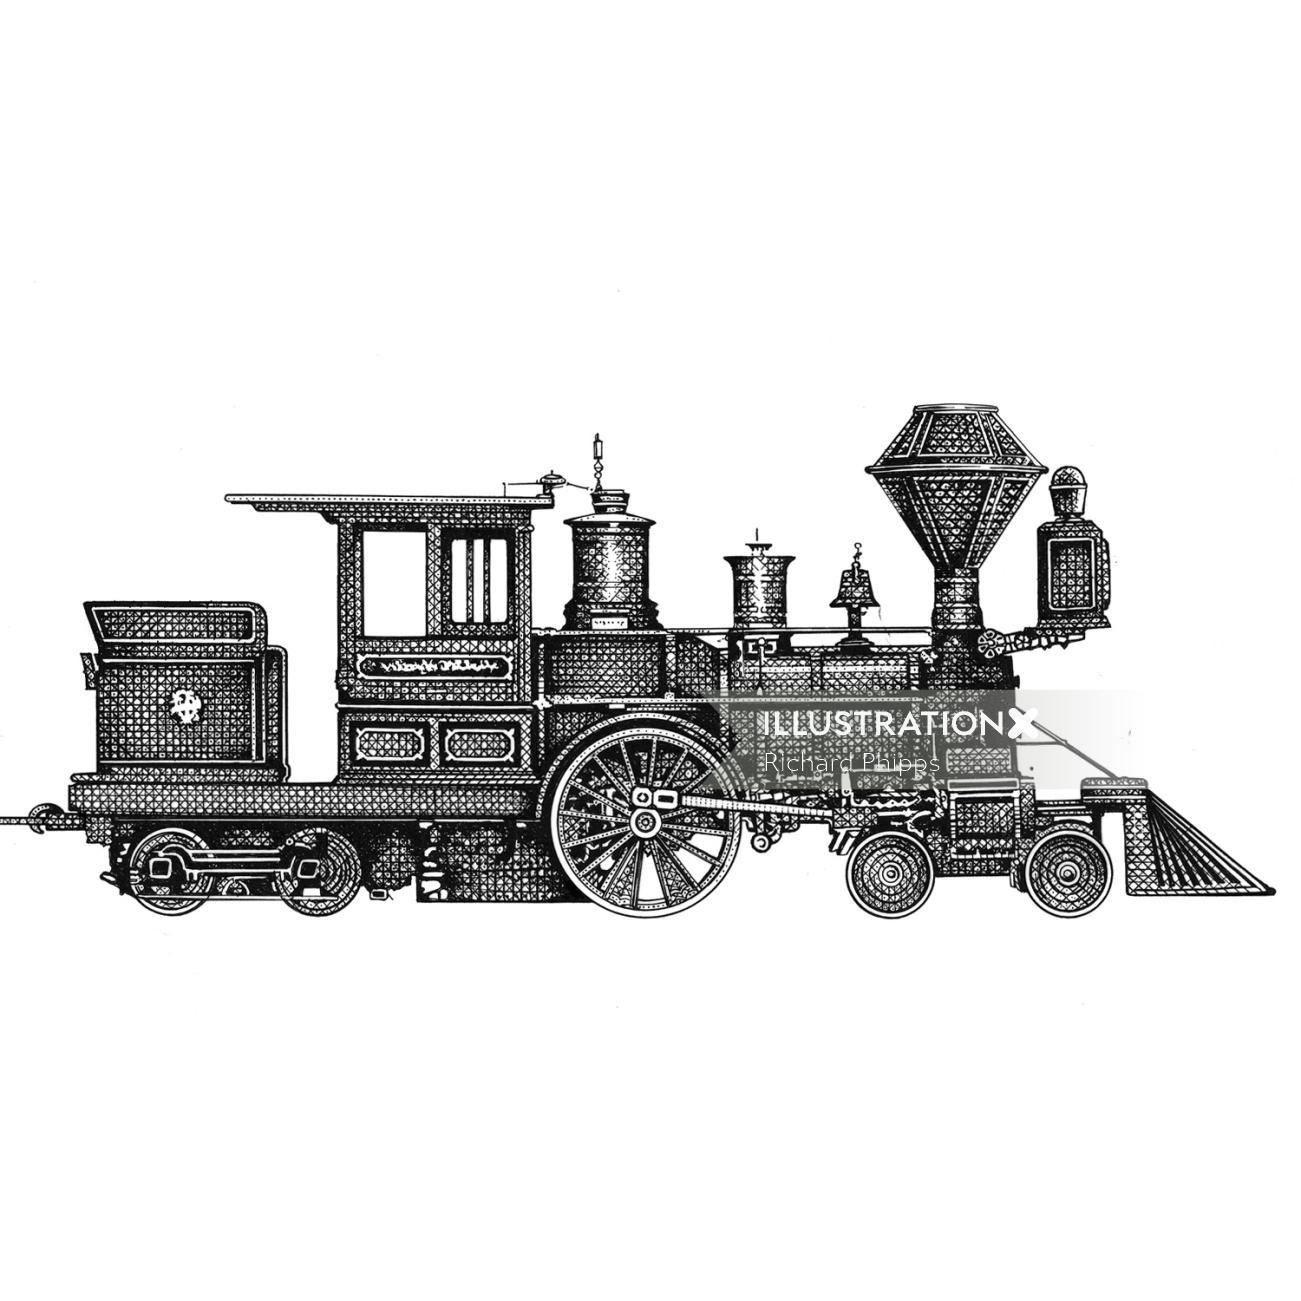 American steam engine